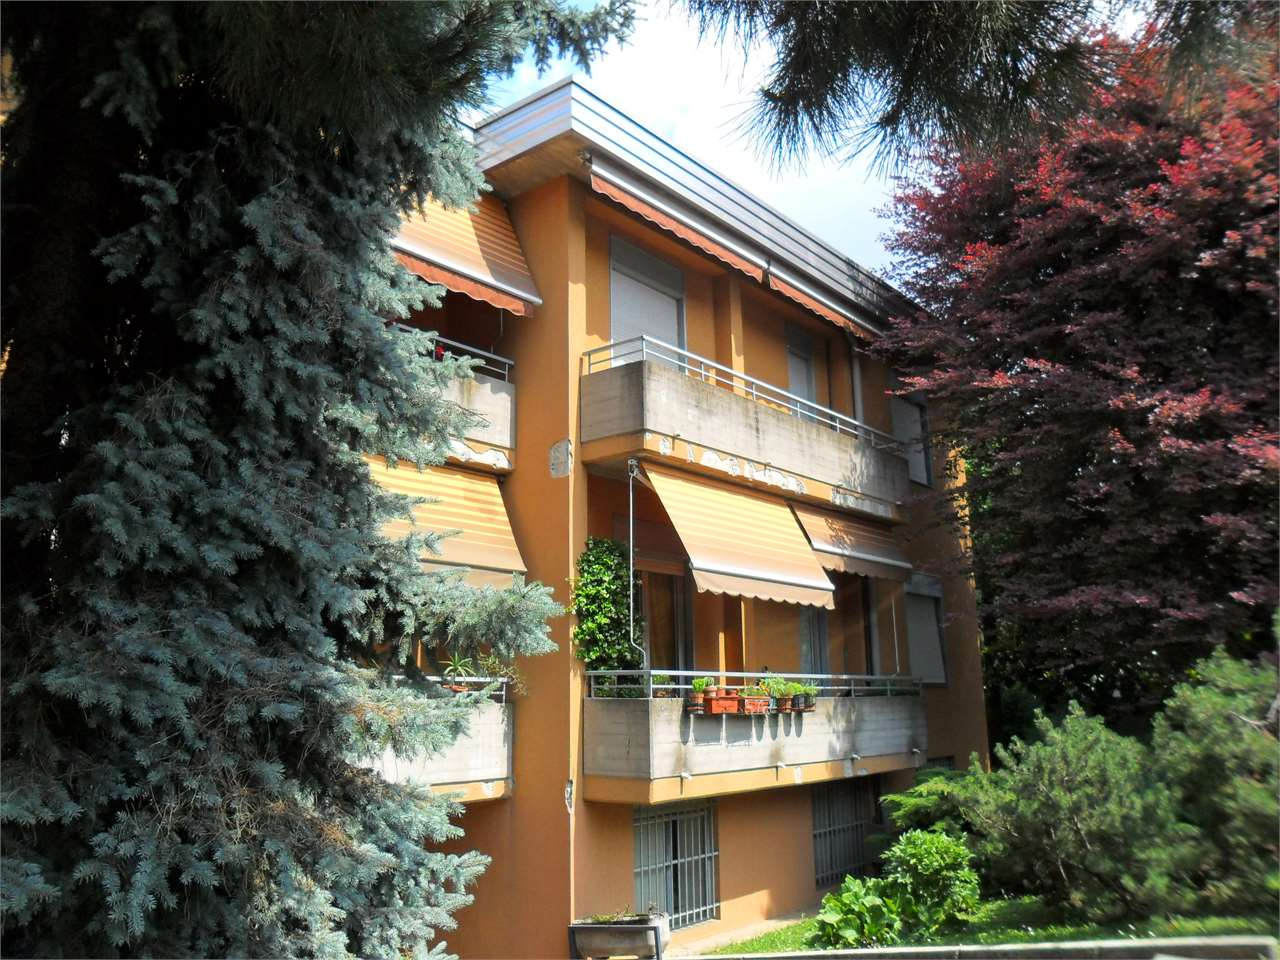 Vendita Monolocale Appartamento Legnano via calabria 18 20058